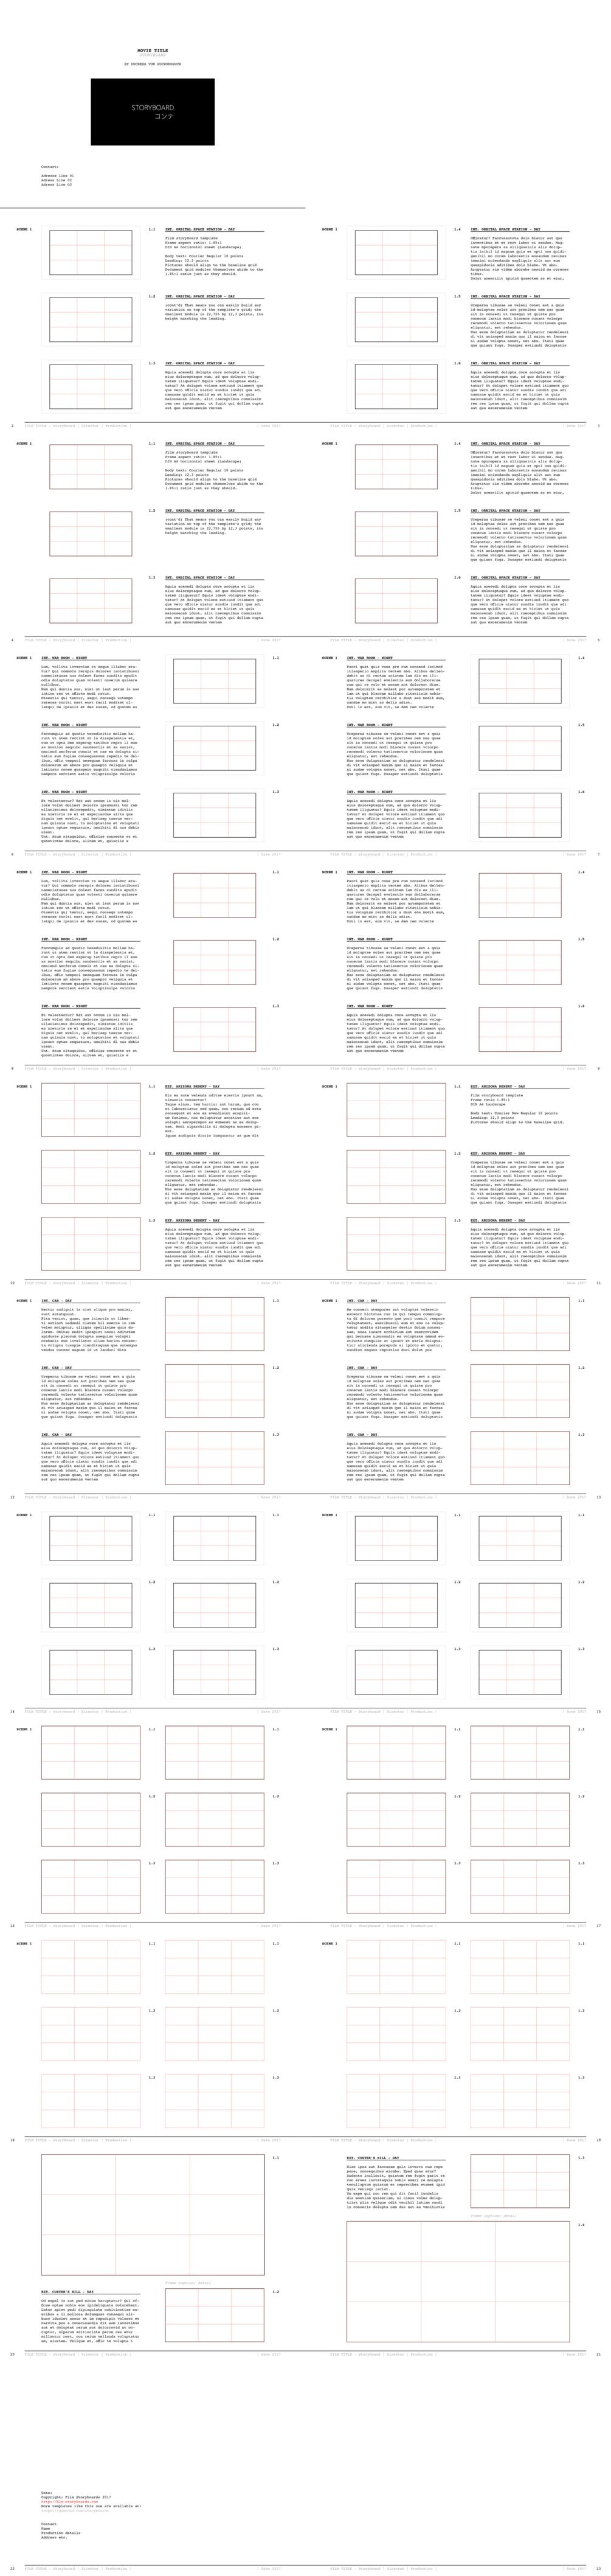 InDesign Storyboard template 1.85:1 Courier 10 on DIN A4 landscape ...